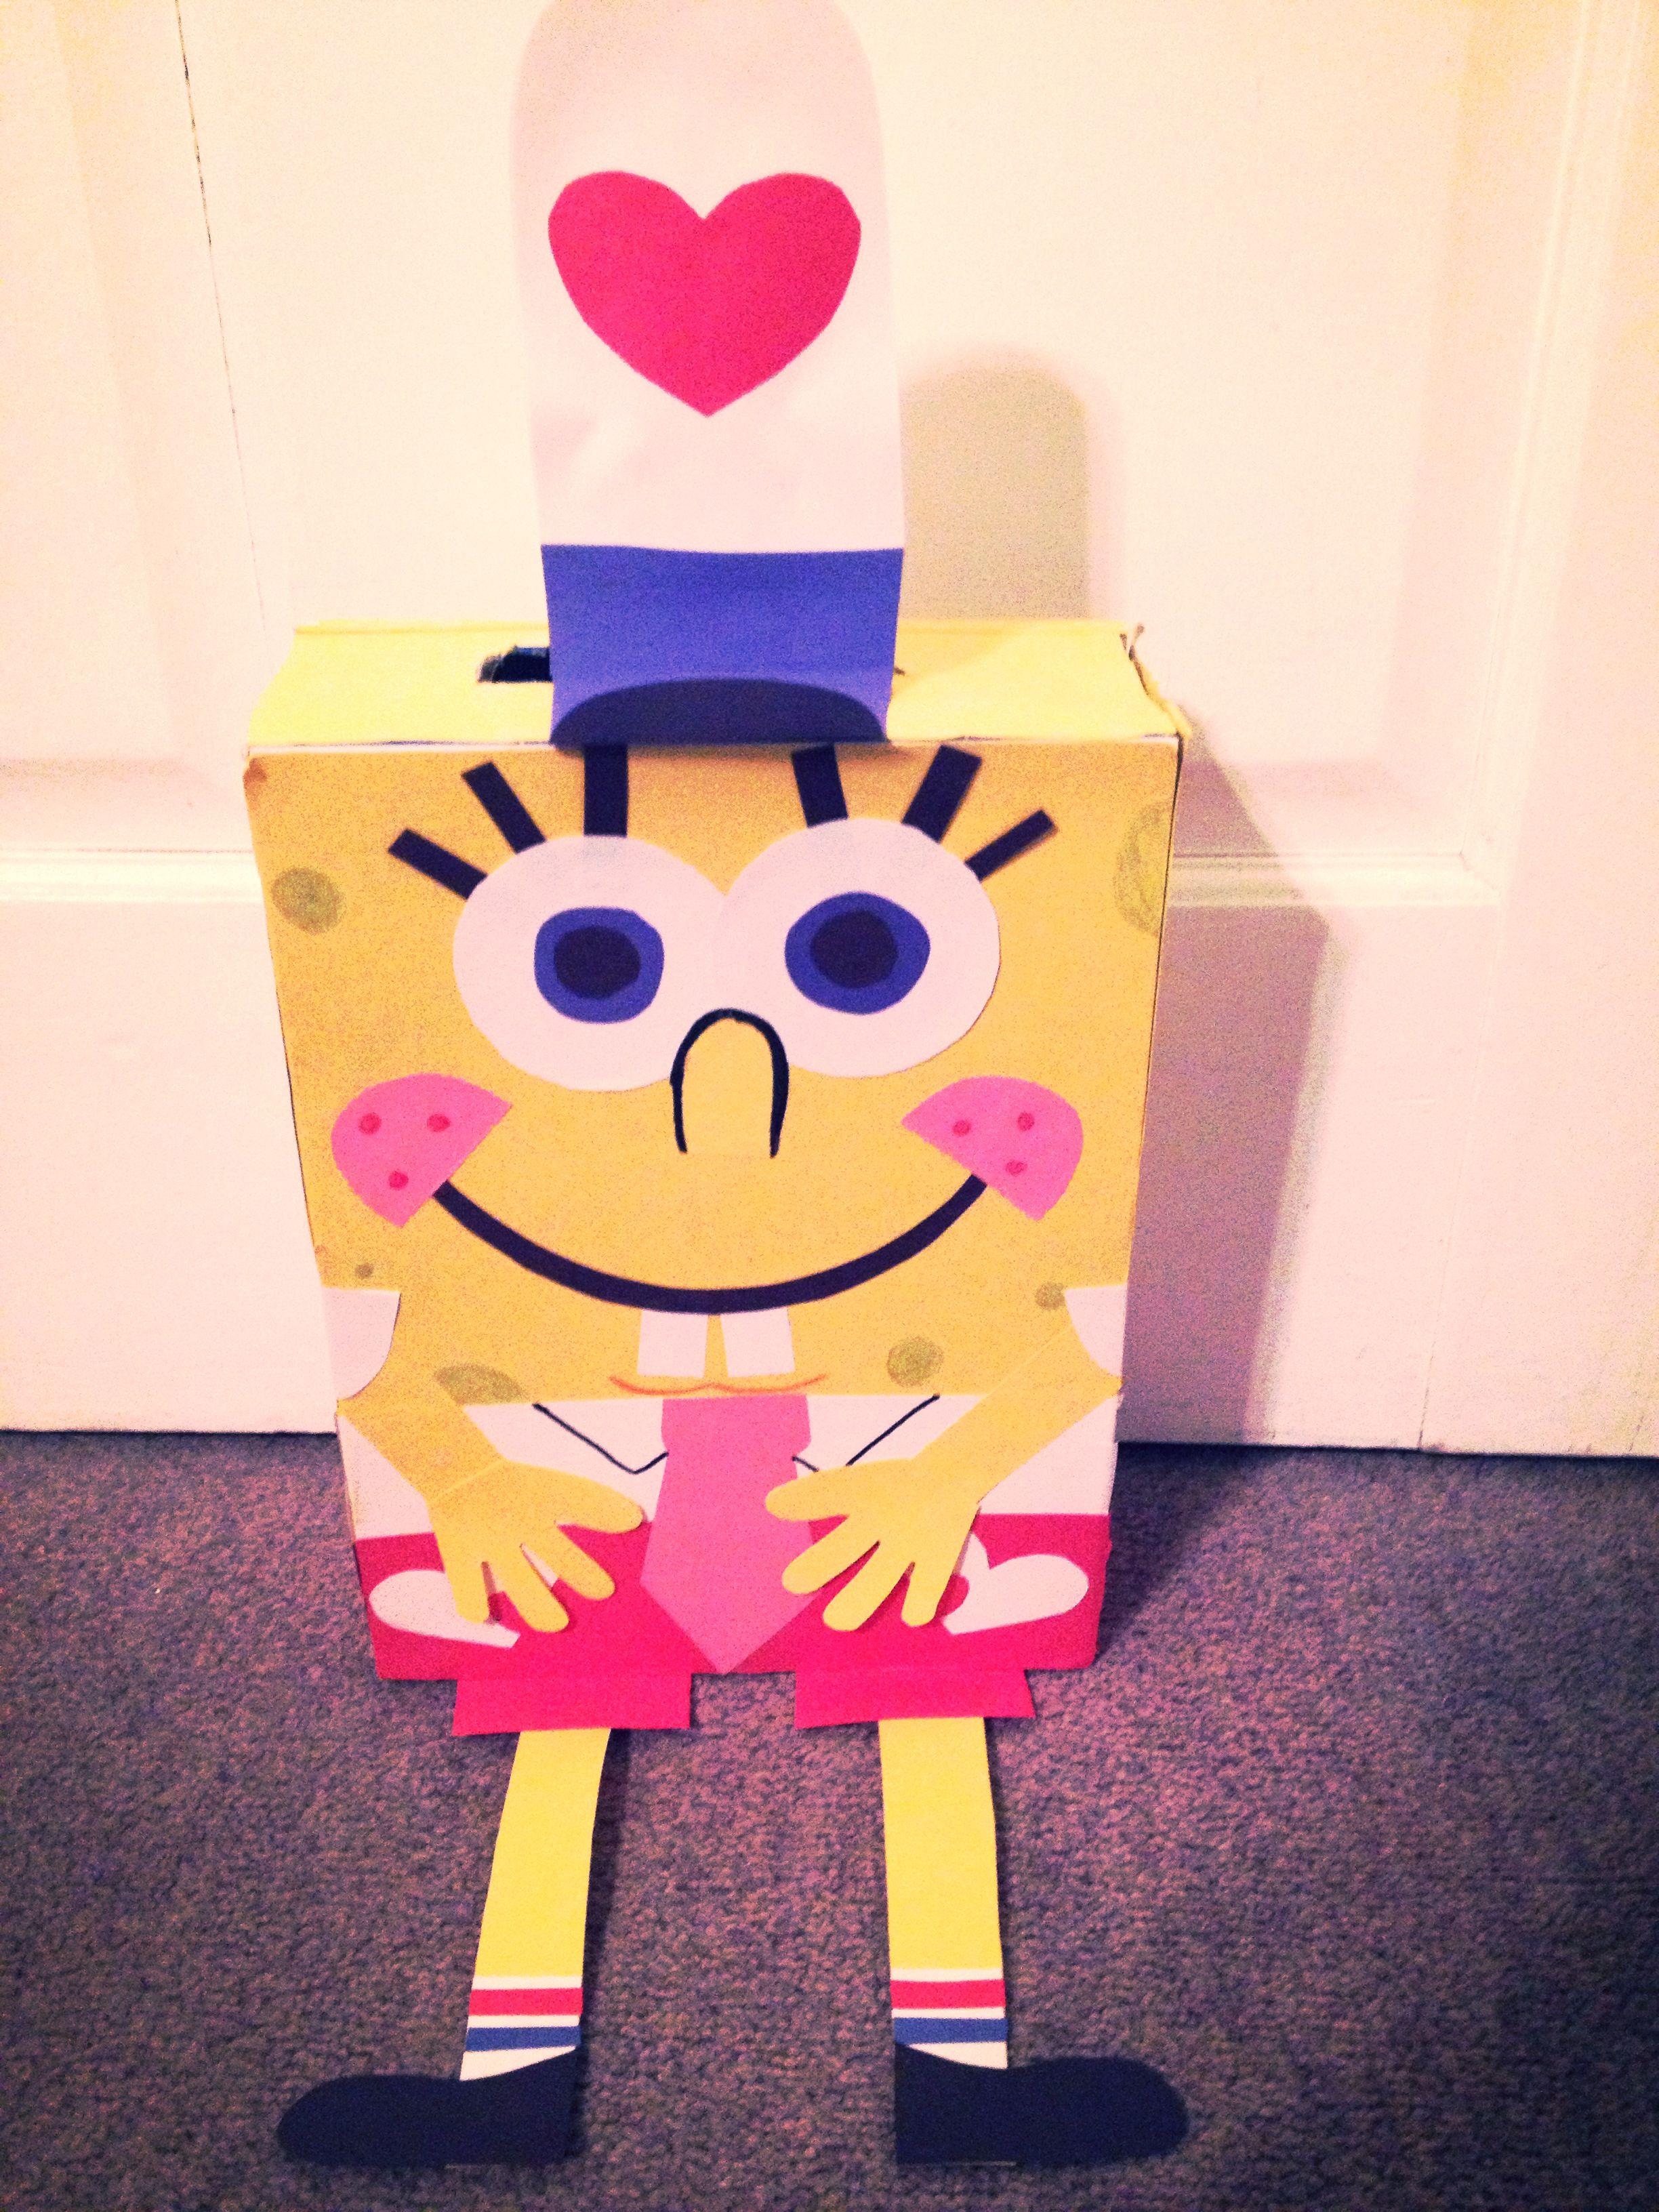 spongebob square pants valentine box super easy cereal boxconstruction - How To Make Valentine Boxes